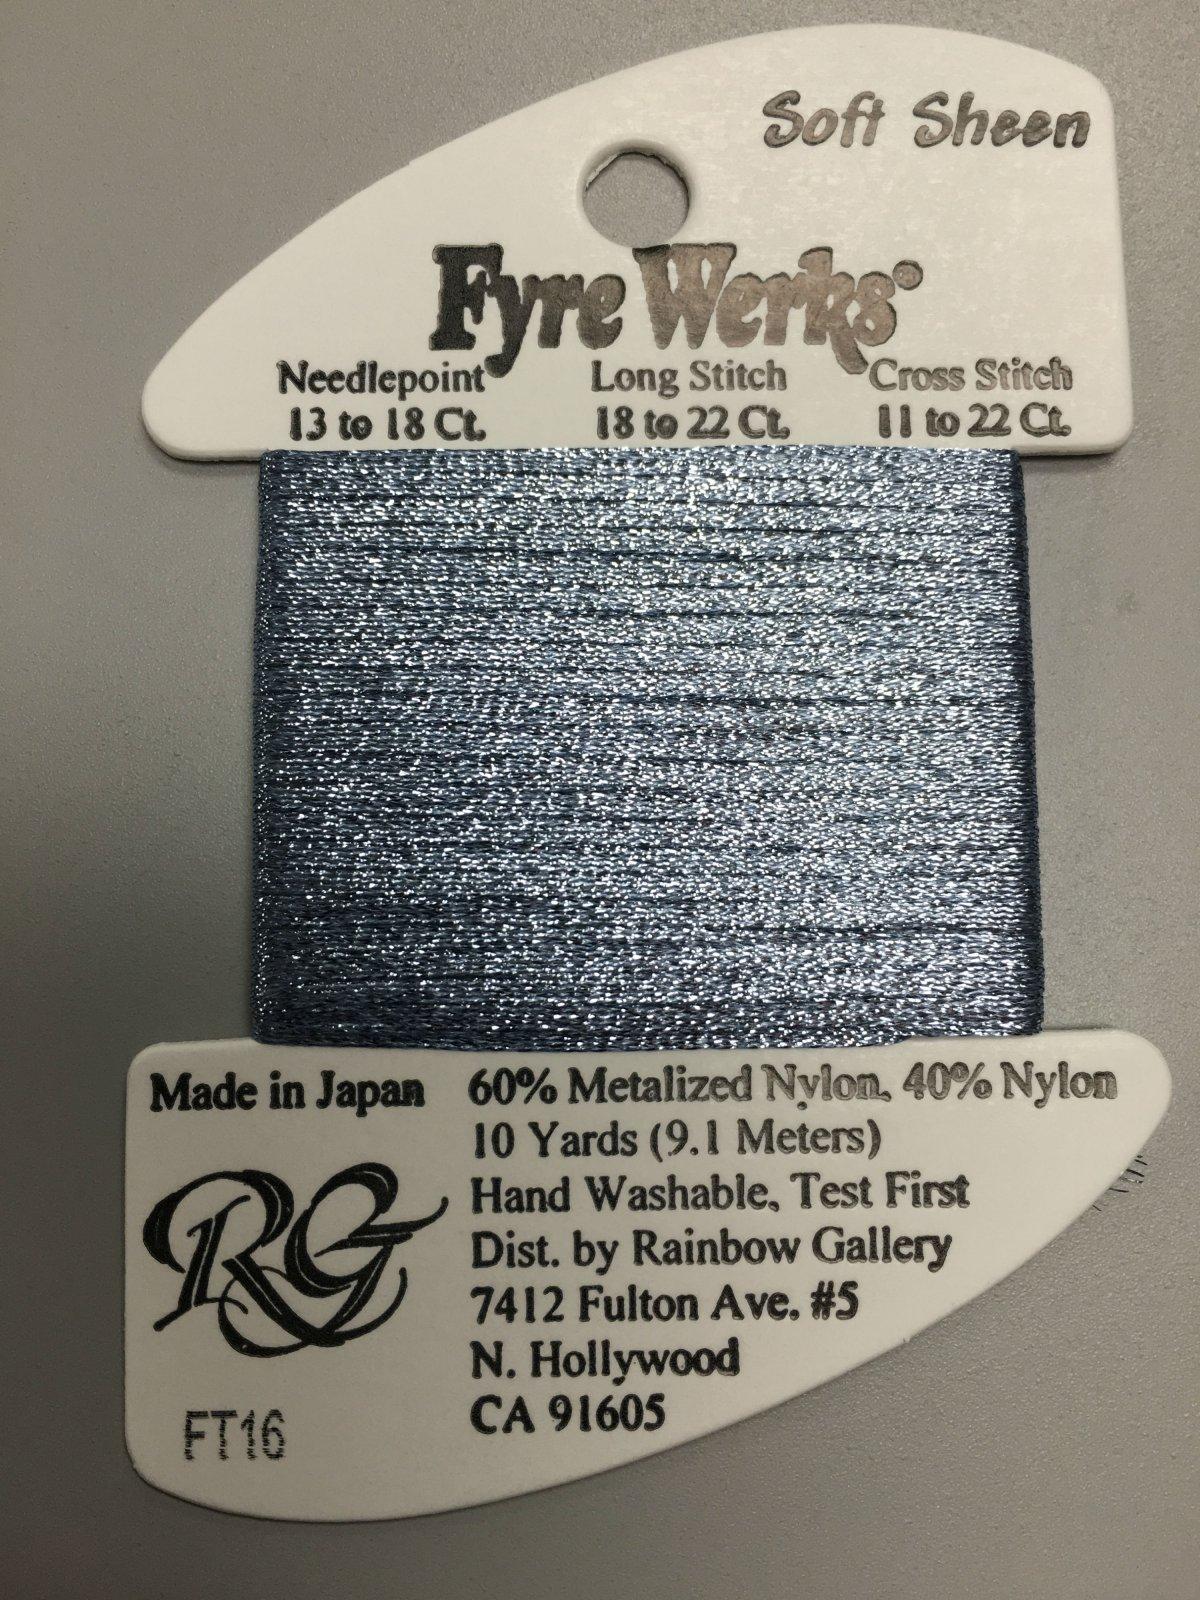 Fyre Werks Soft Sheen FT16